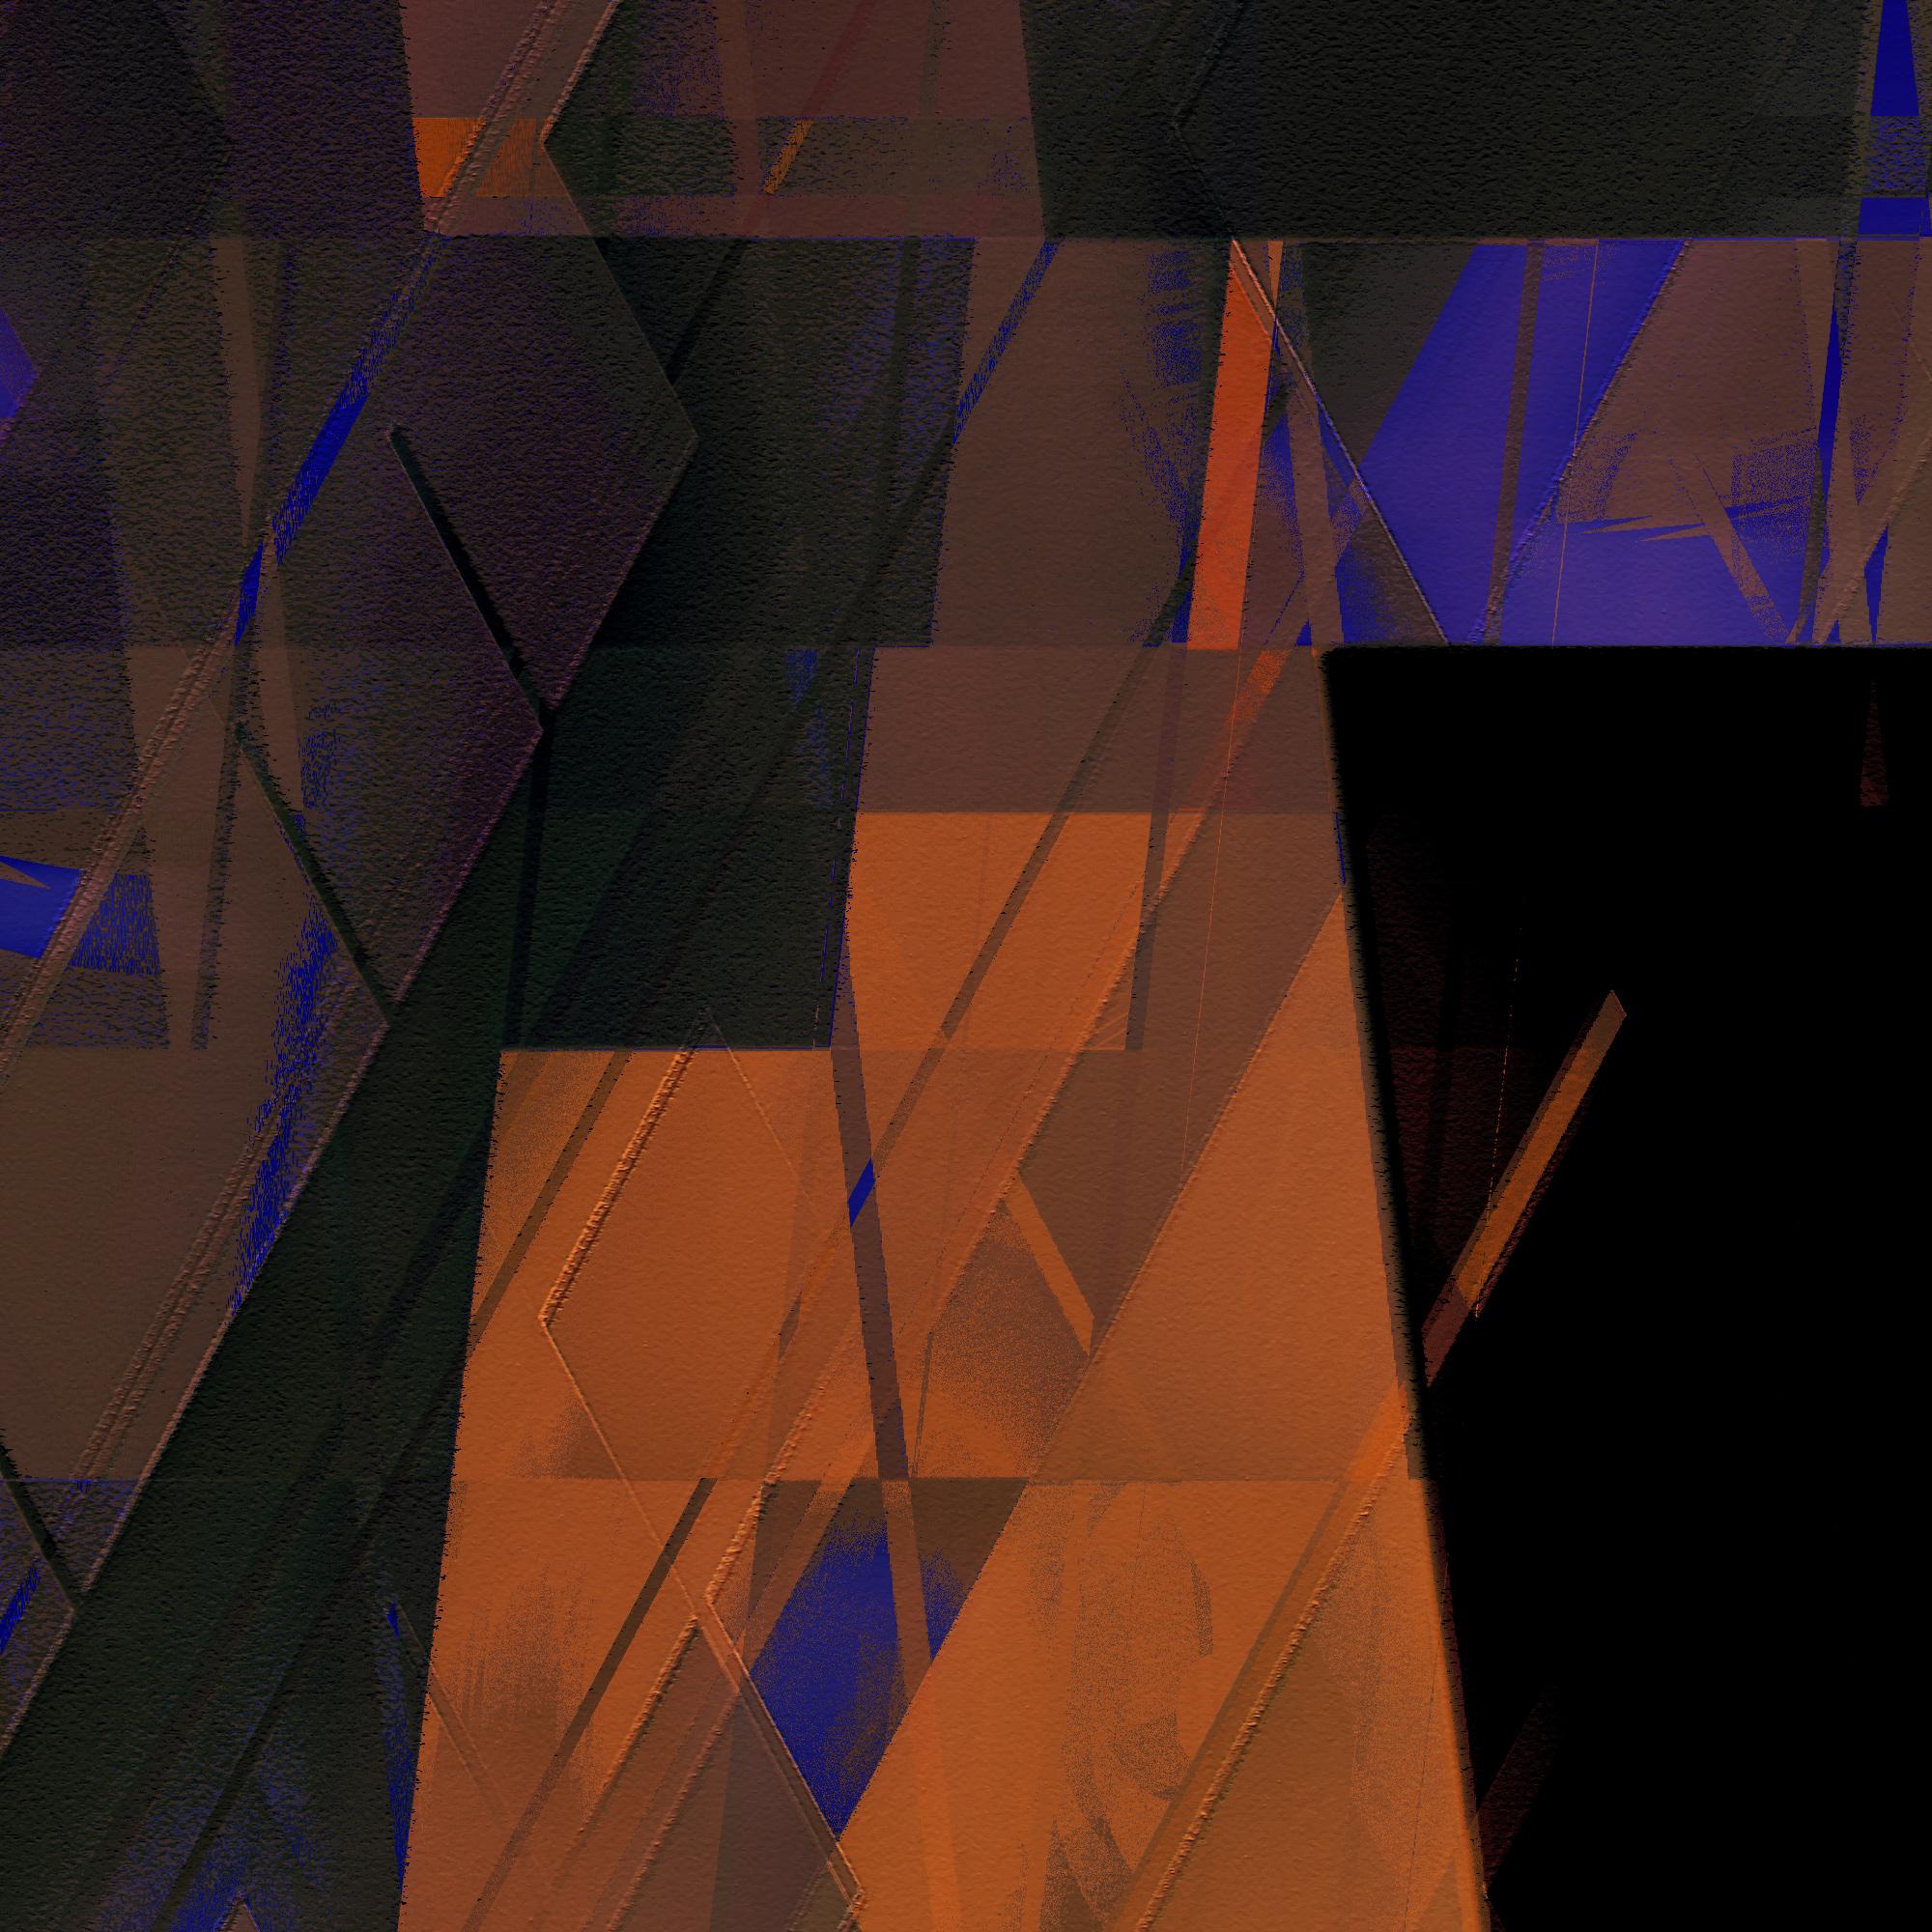 190404_Netherworld_detail1.jpg